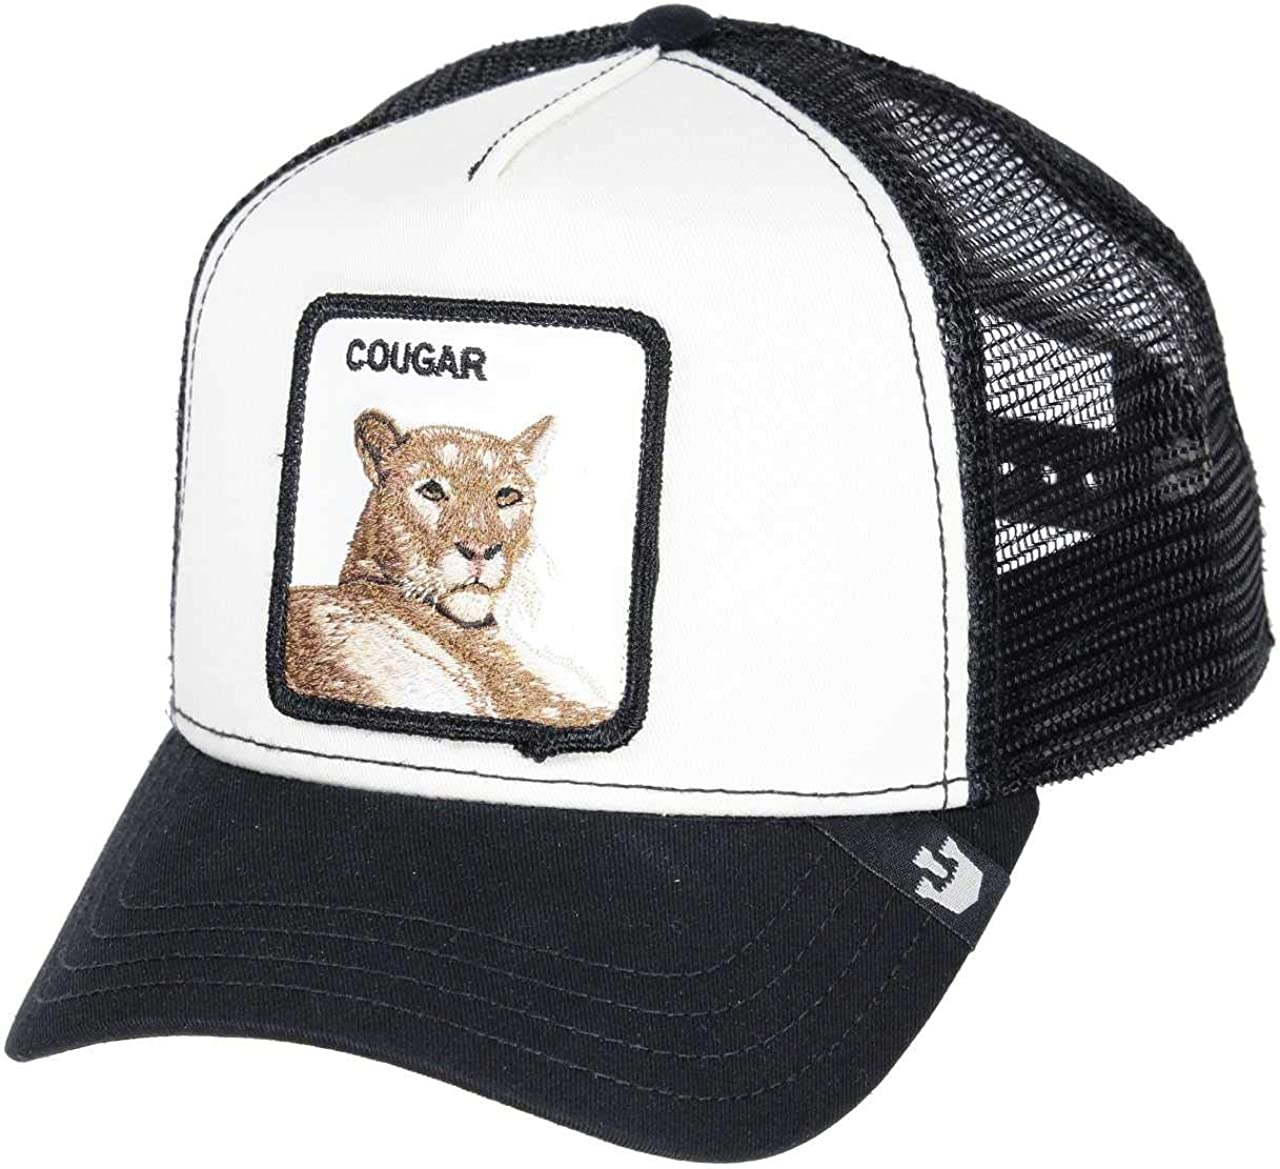 Goorin Bros. | Gorra de béisbol Cougar Negra | GOB_101-0570-BLK ...